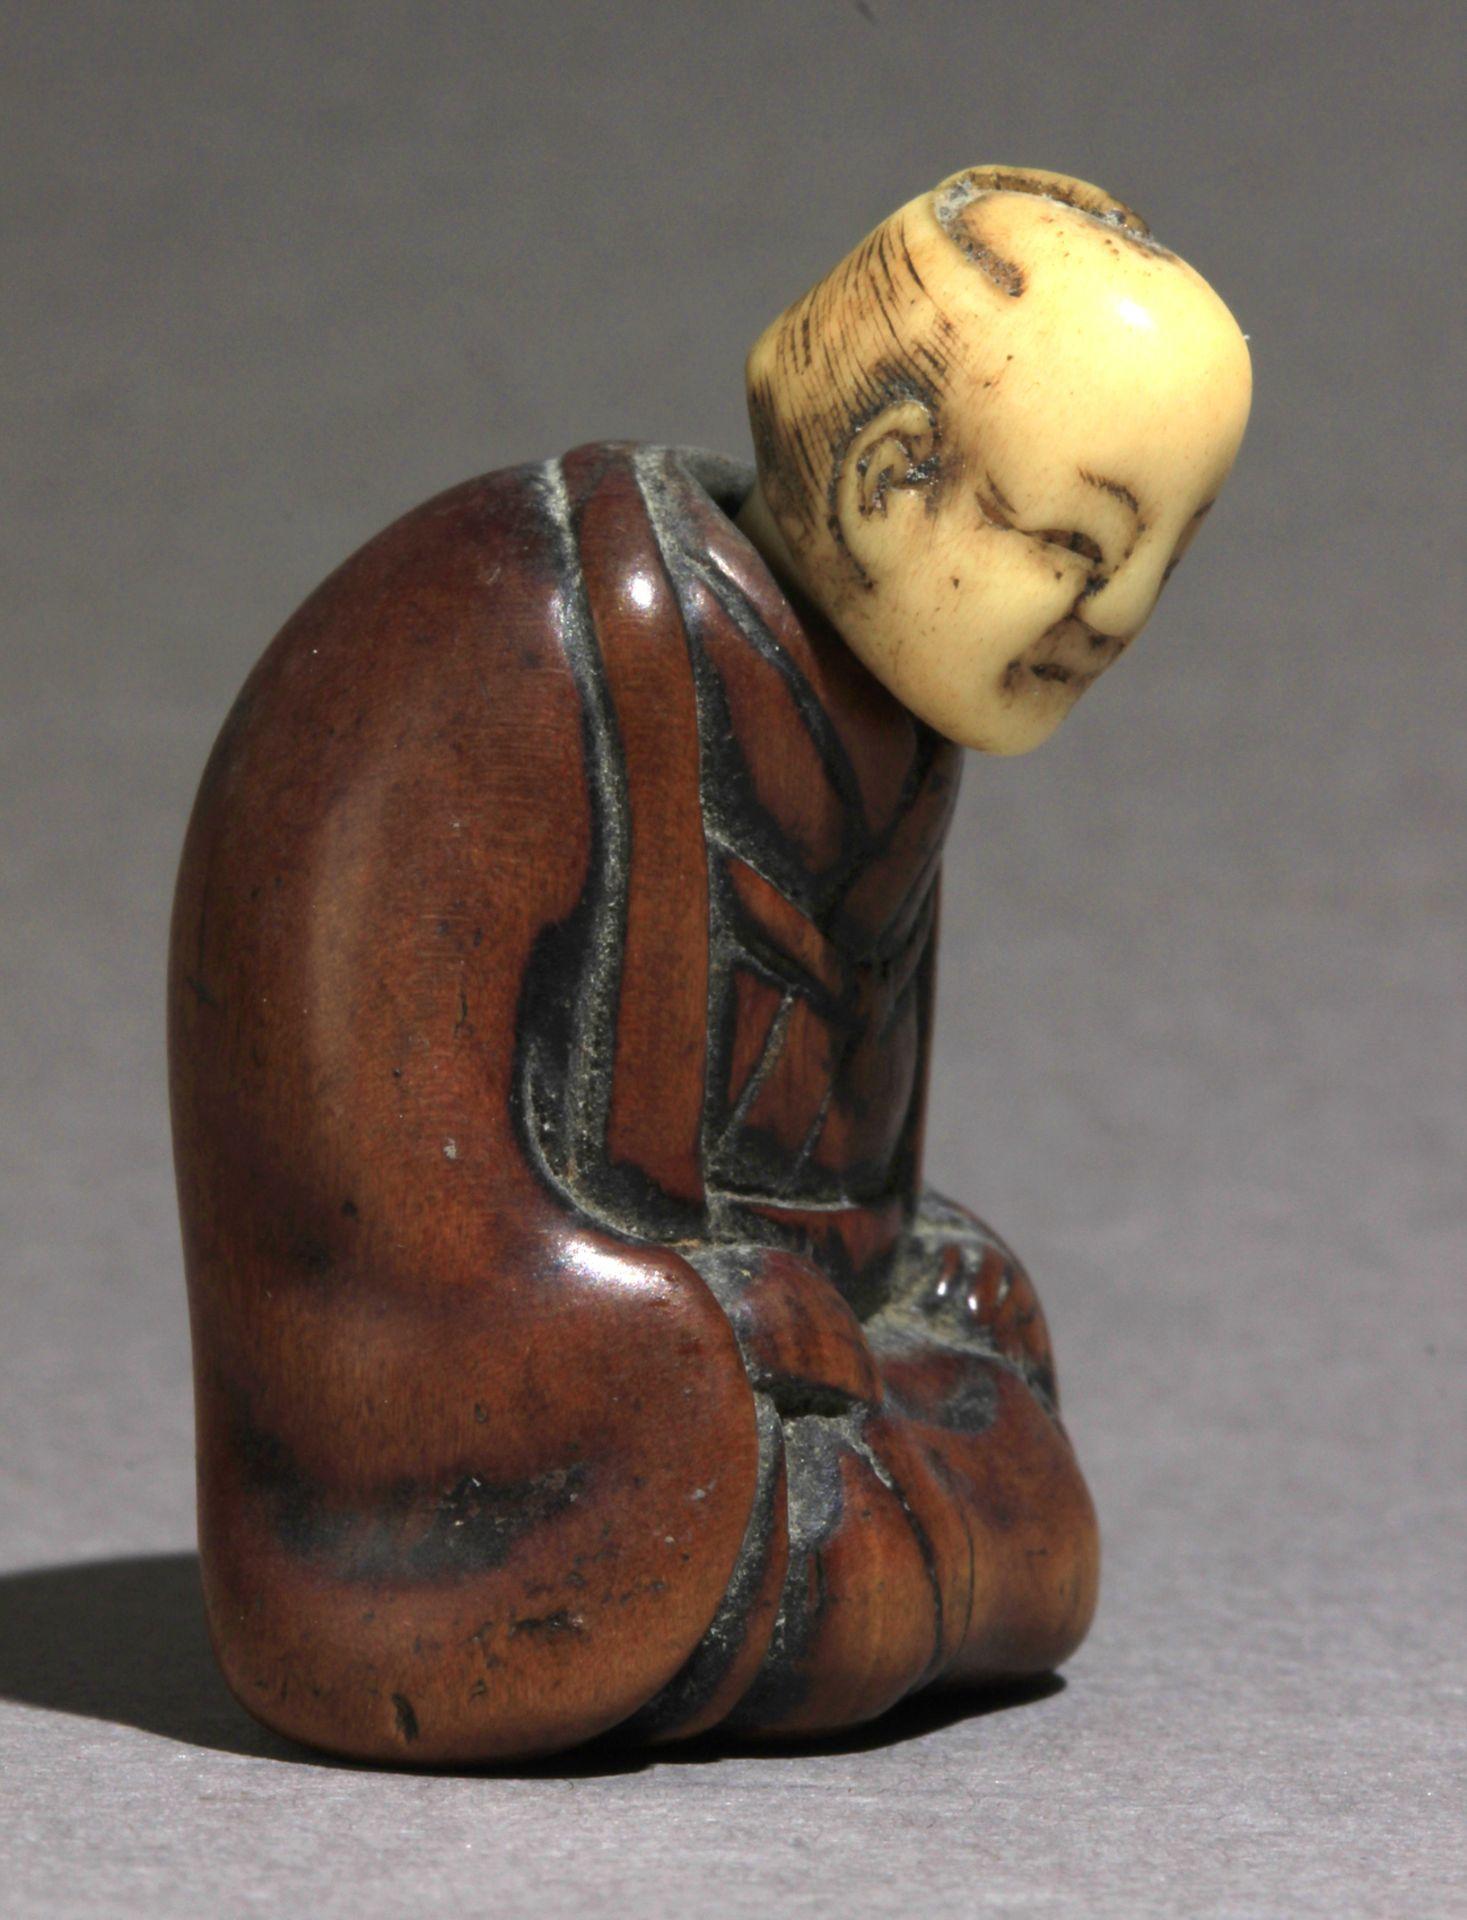 A 19th century Japanese netsuke from Edo period - Image 5 of 8